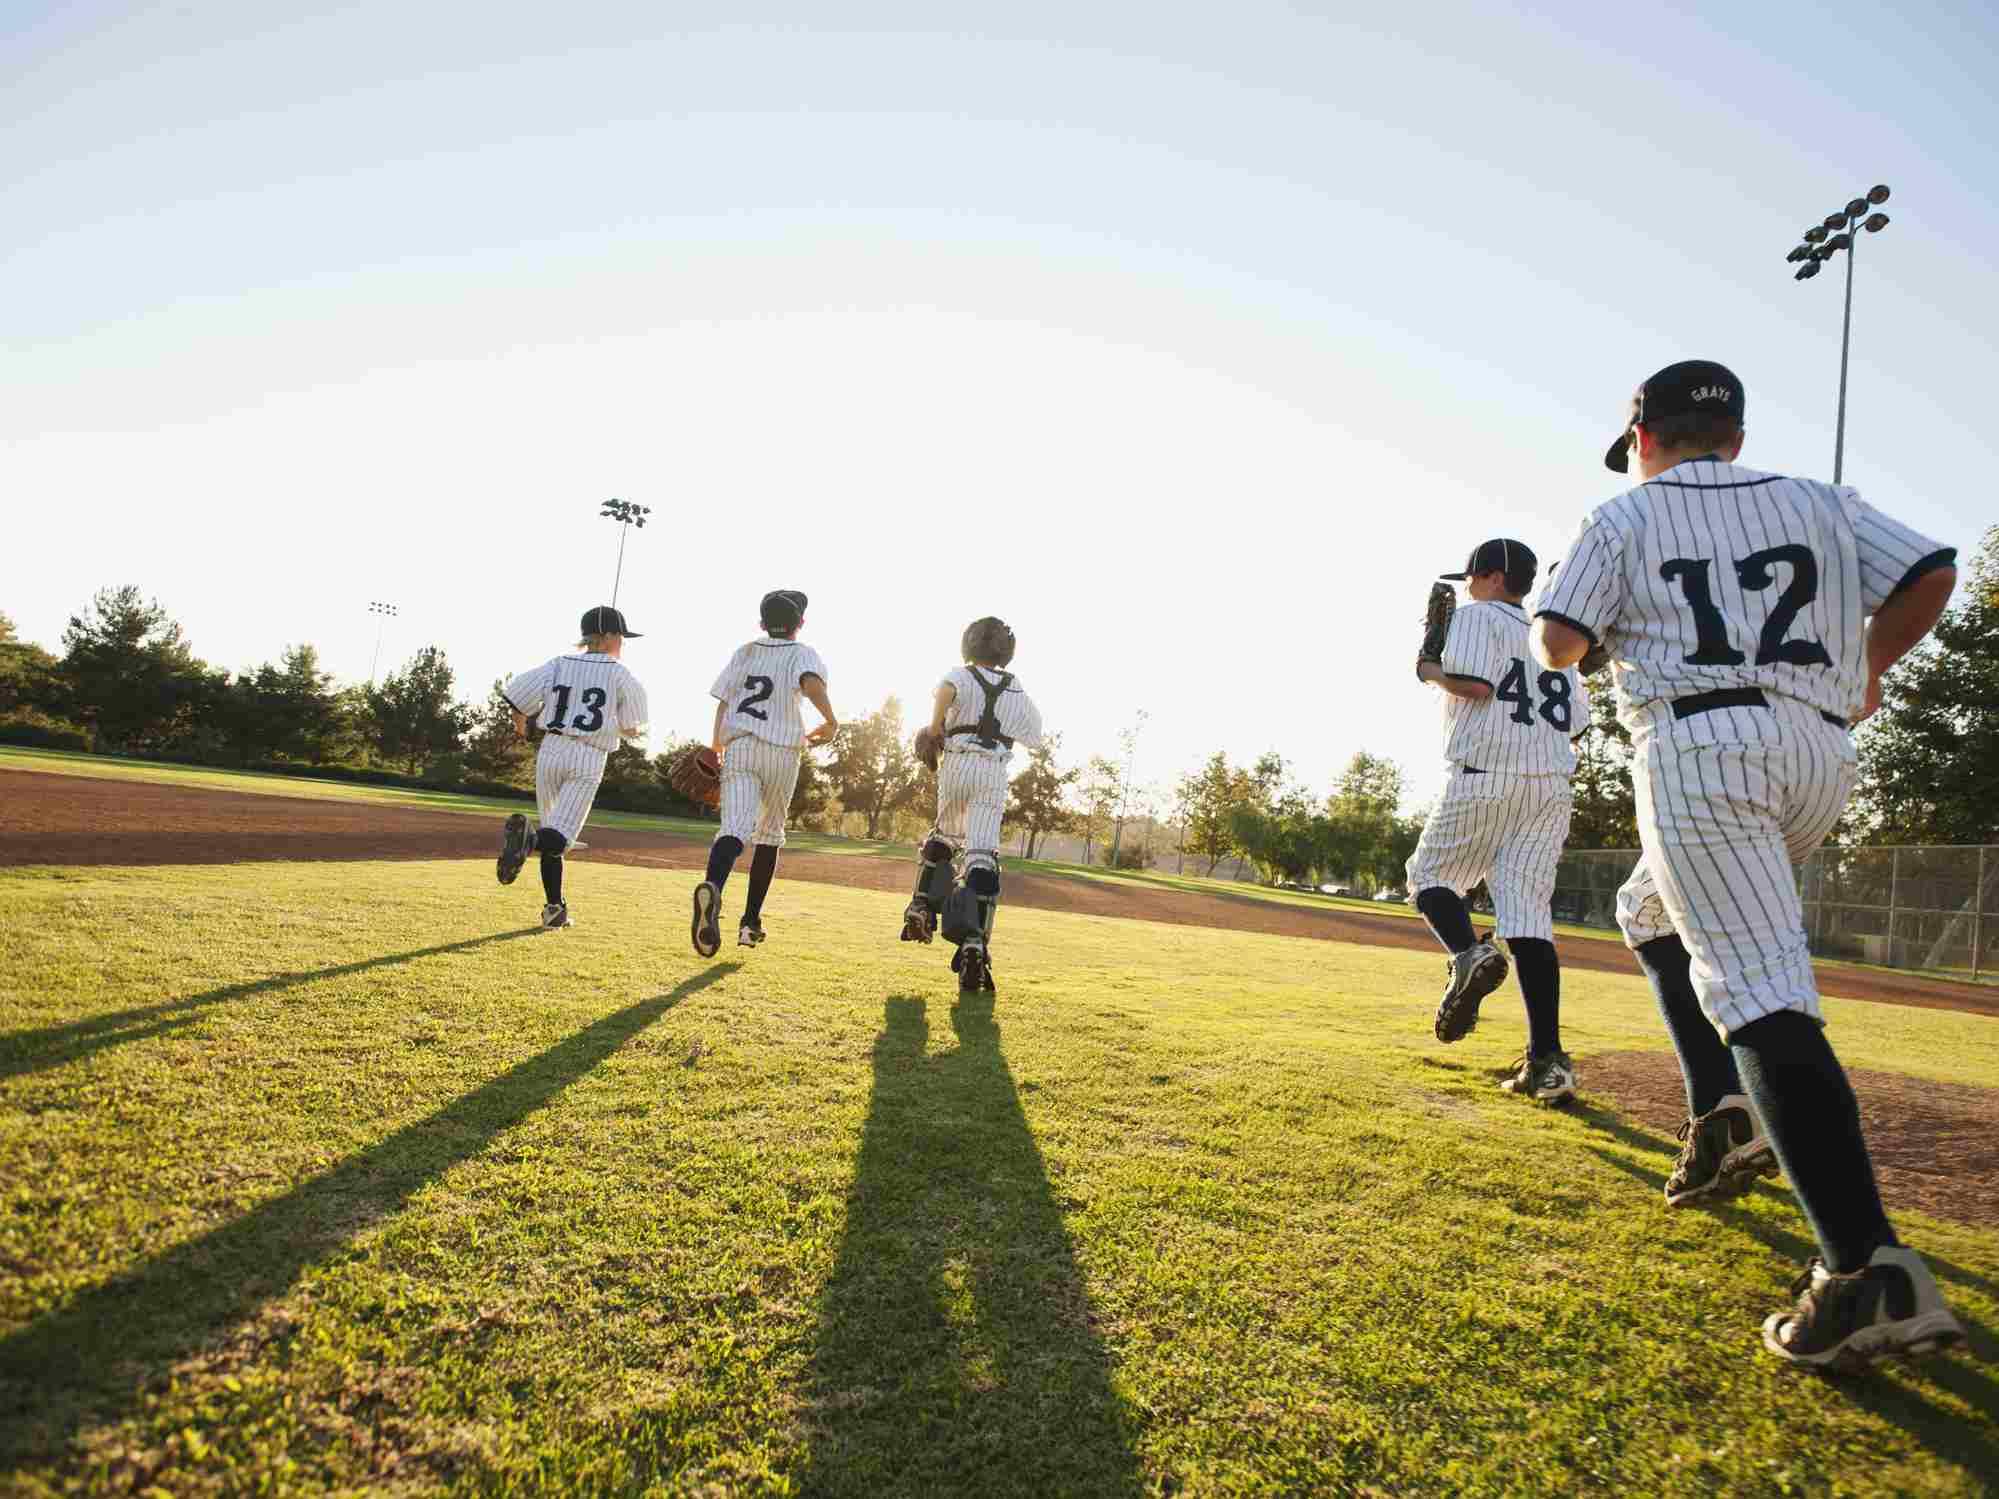 Baseball players running on baseball diamond